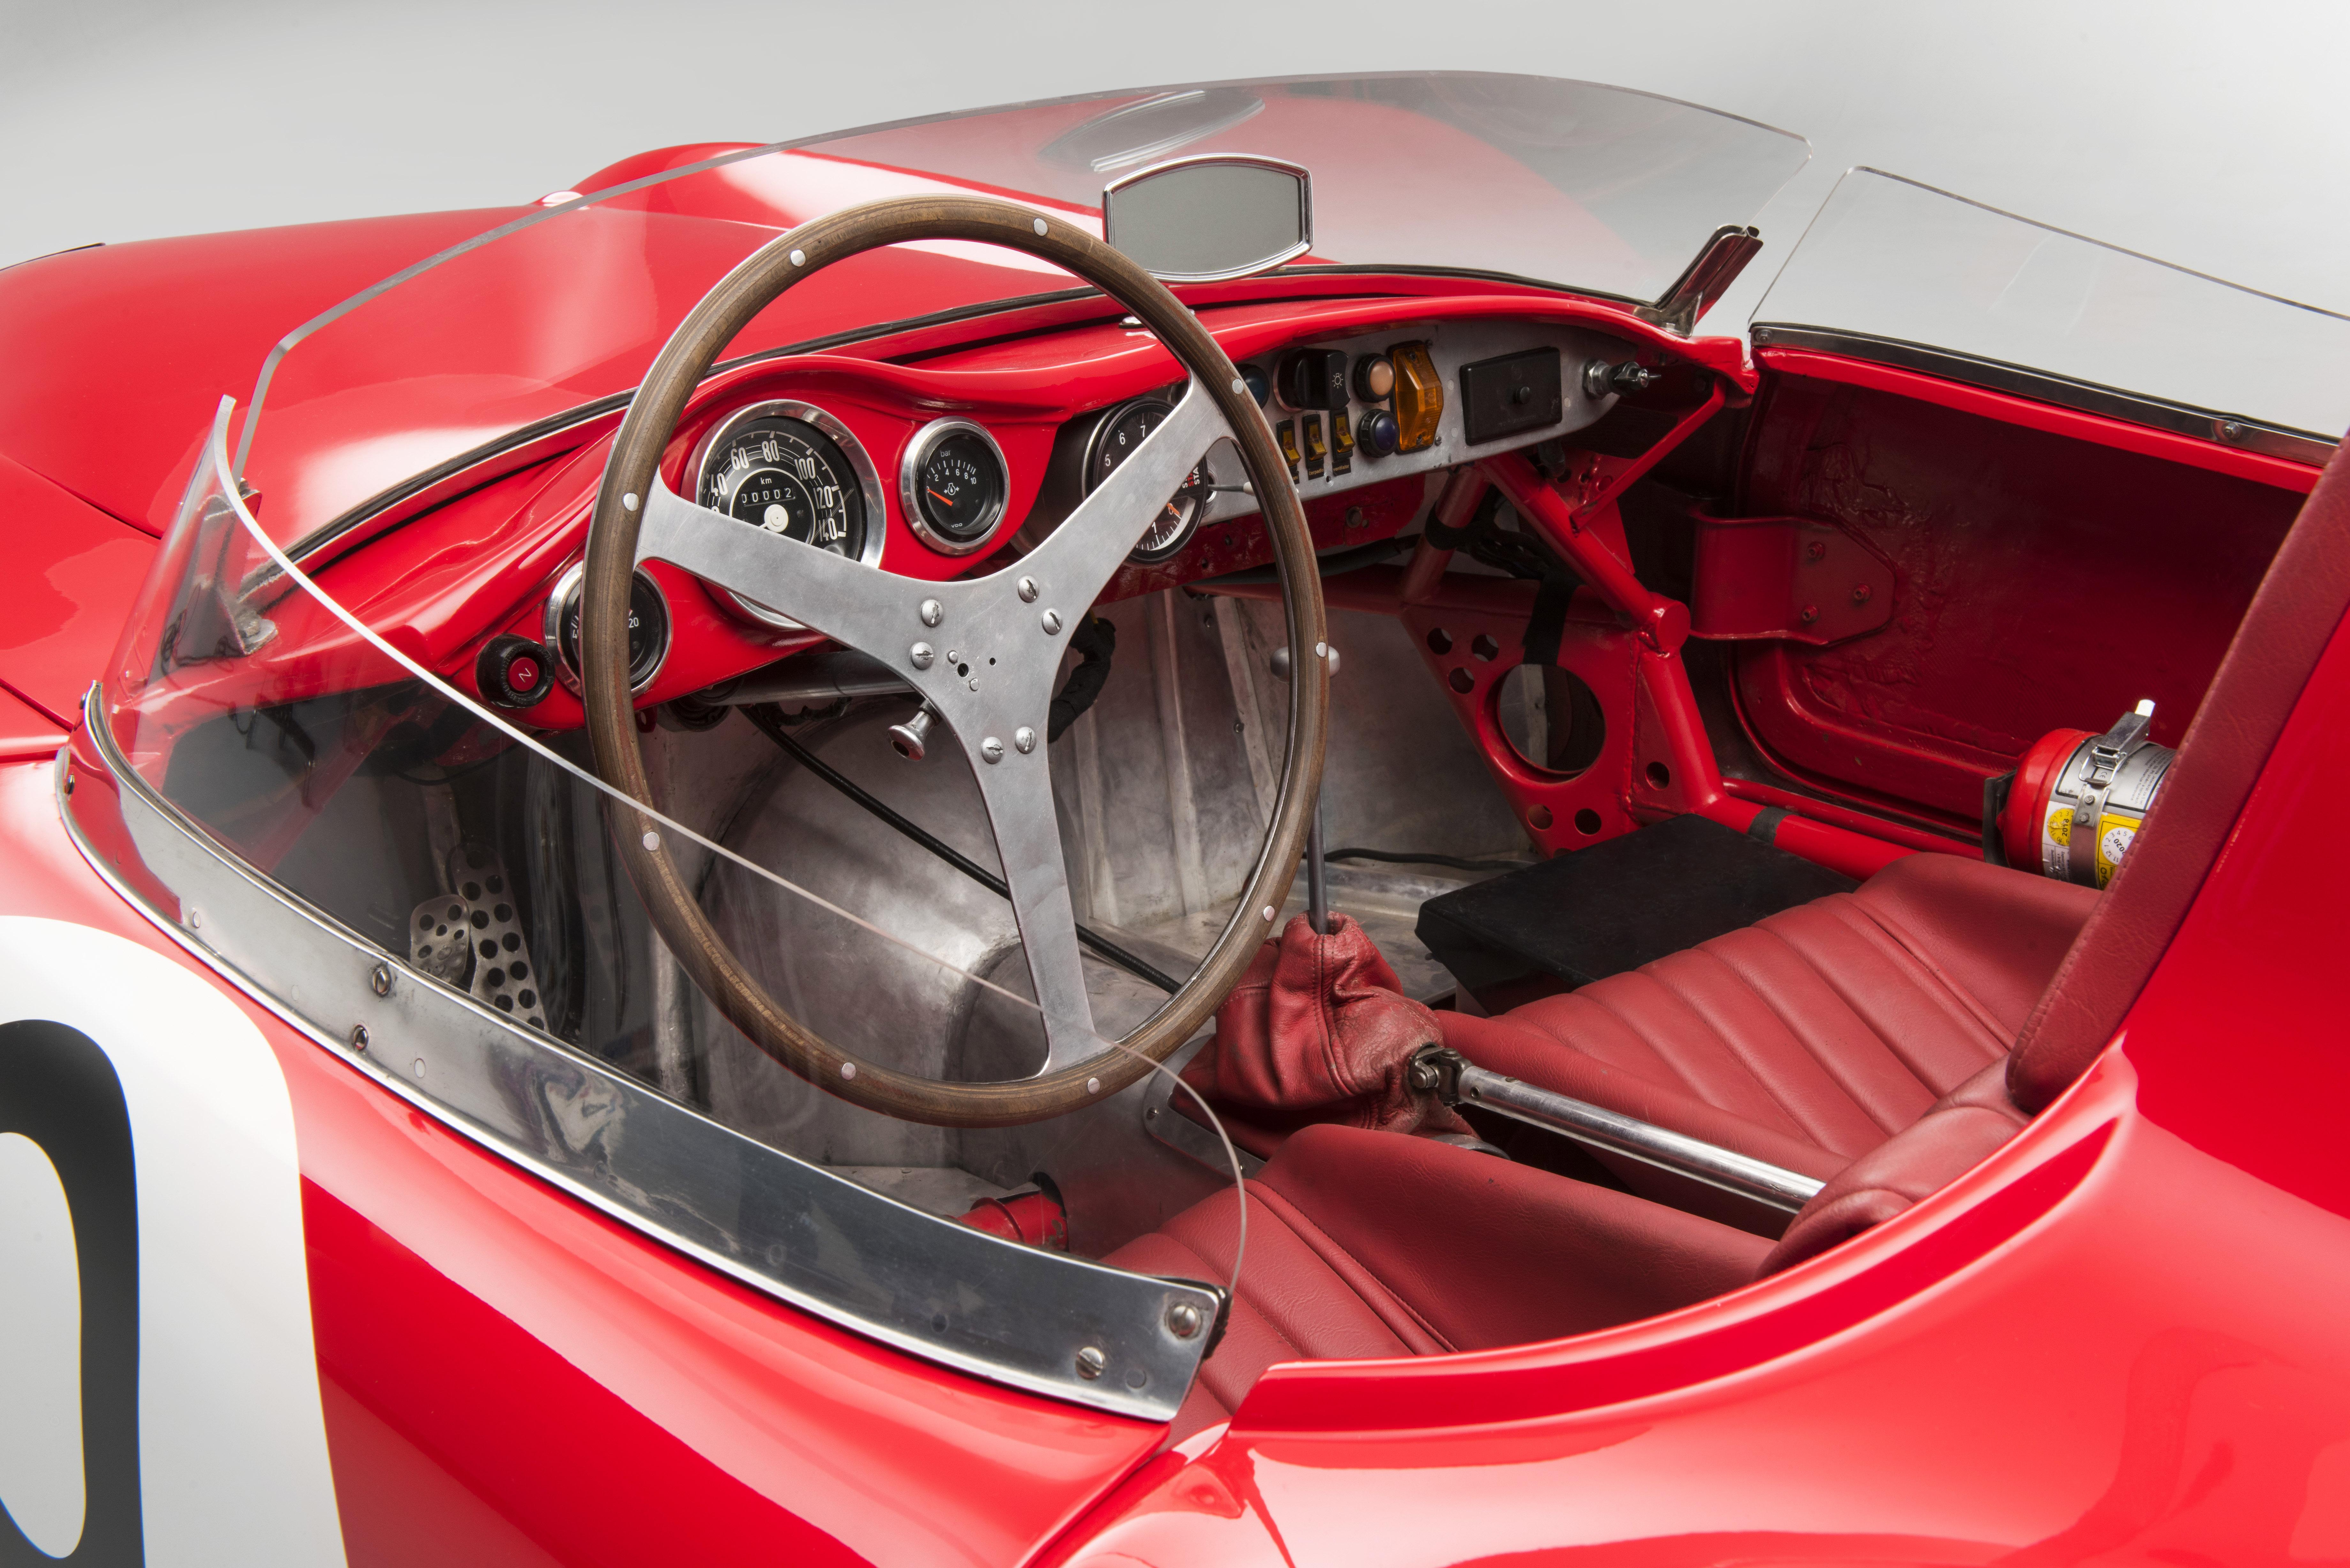 SKODA 1100 OHC (1957): The beautiful dream of Le Mans - Image 6